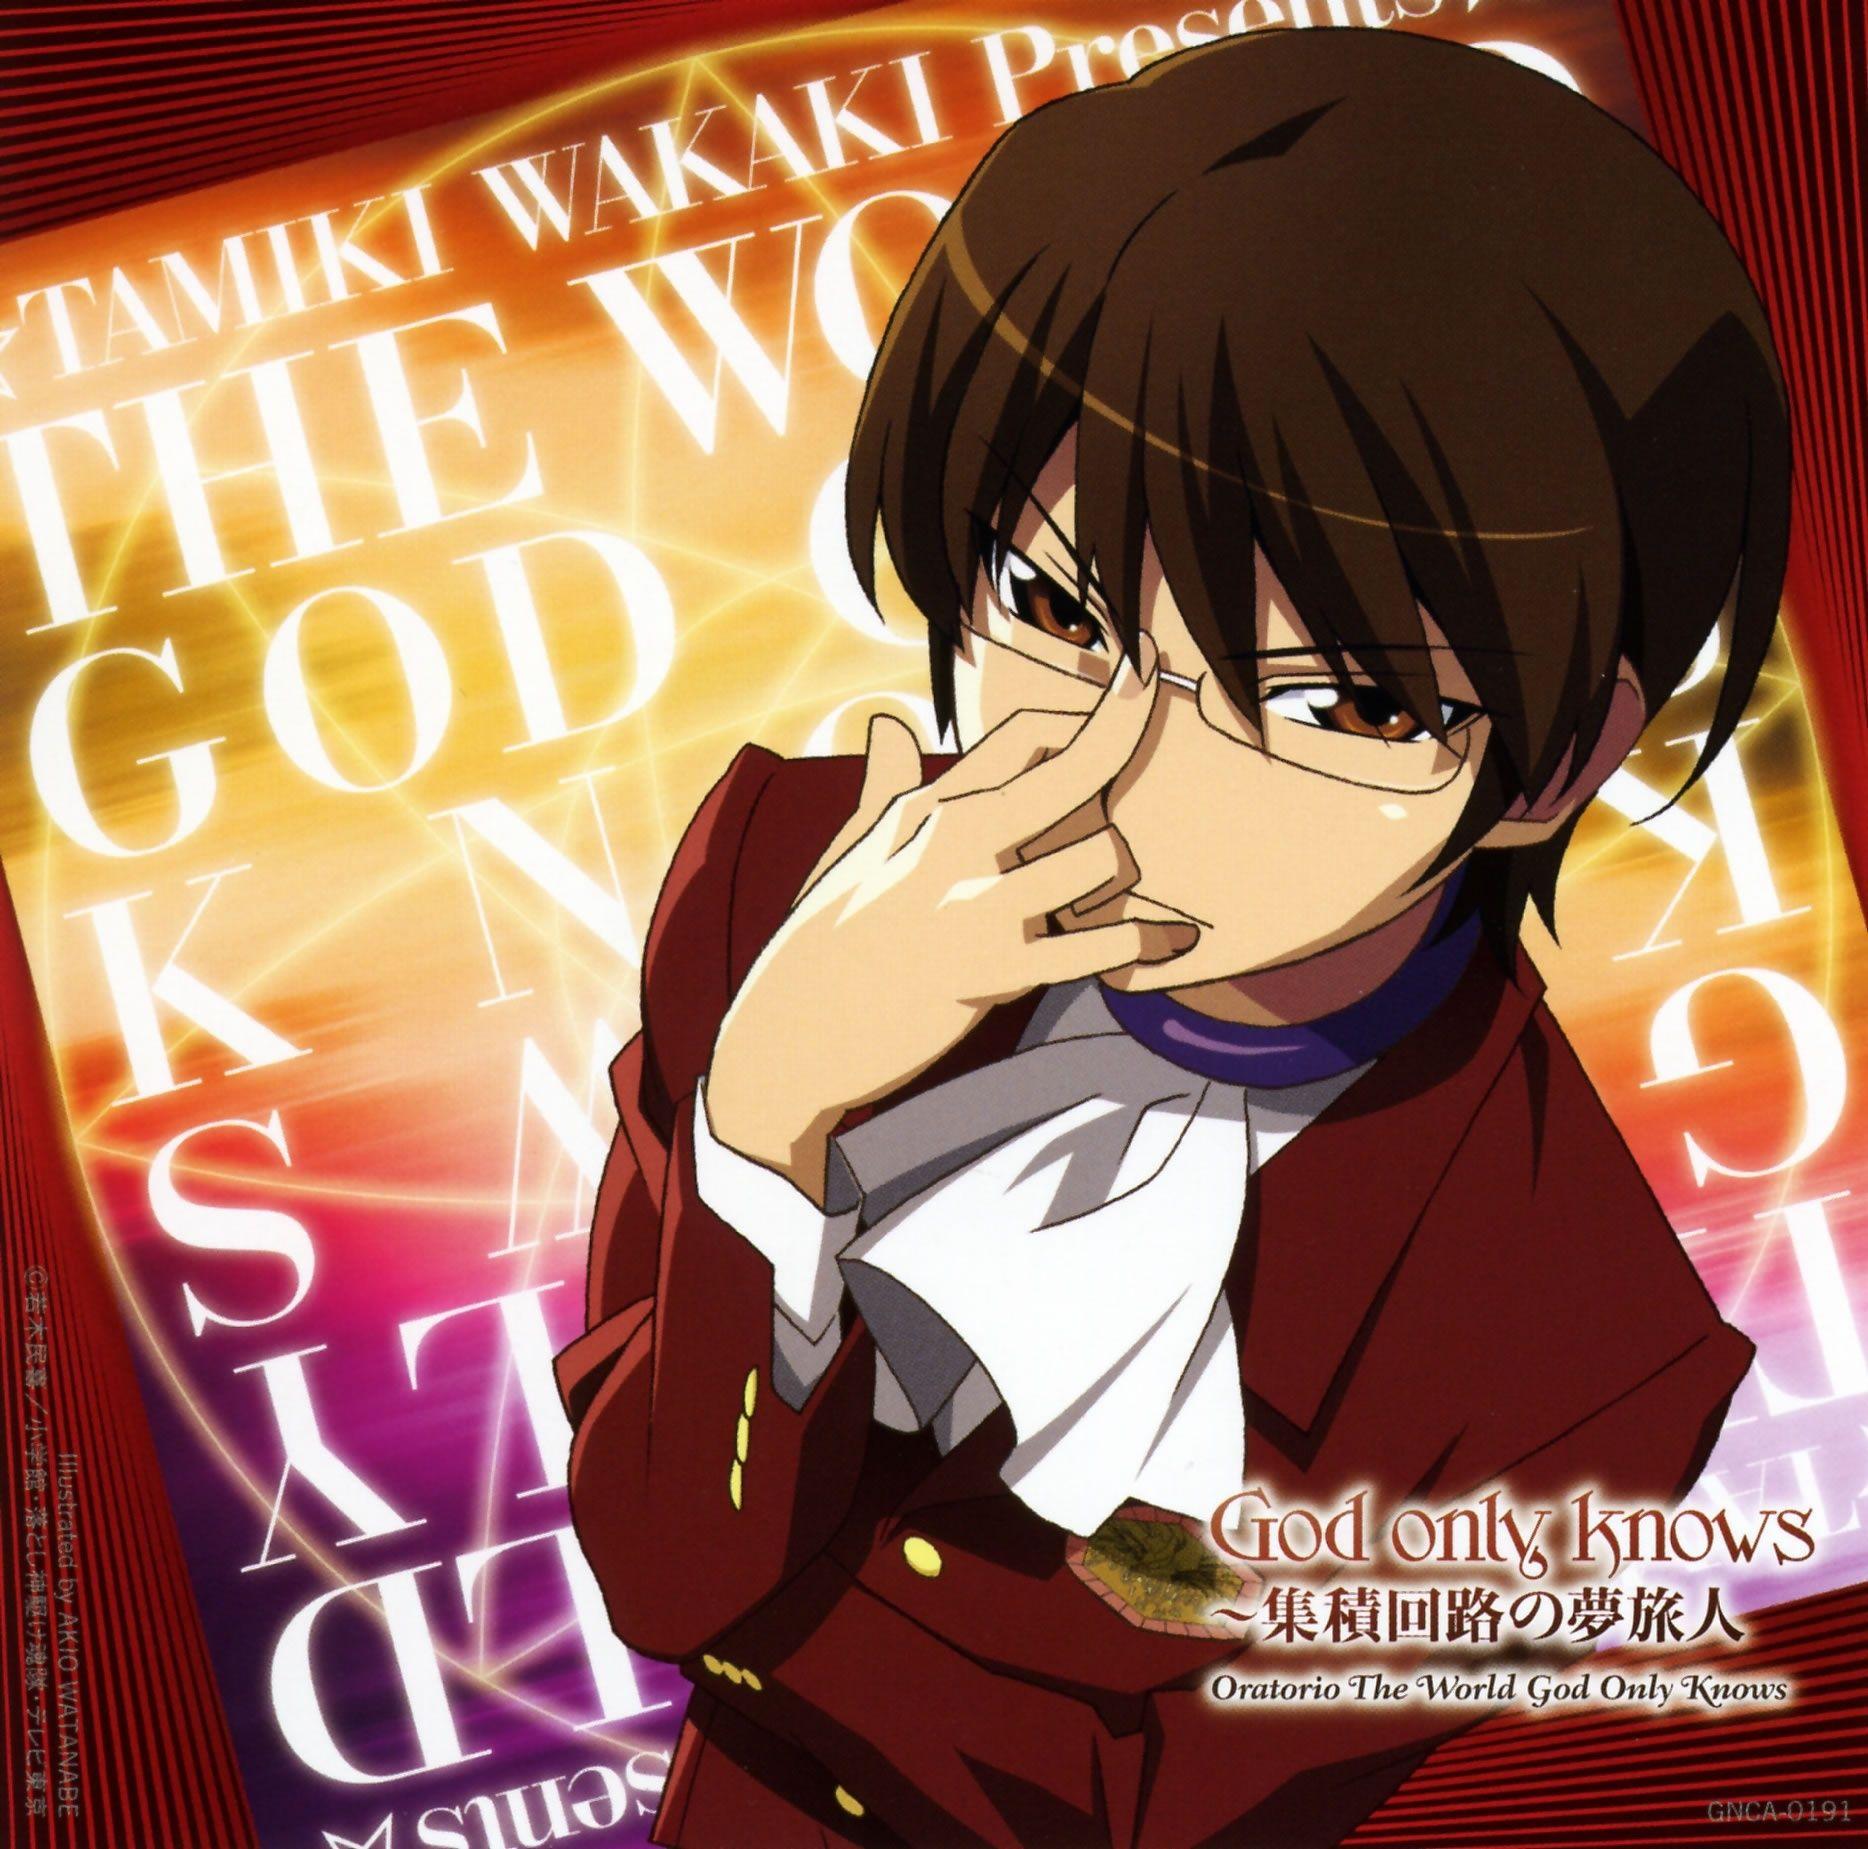 Katsuragi Keima God of Gaming The World God Only Knows